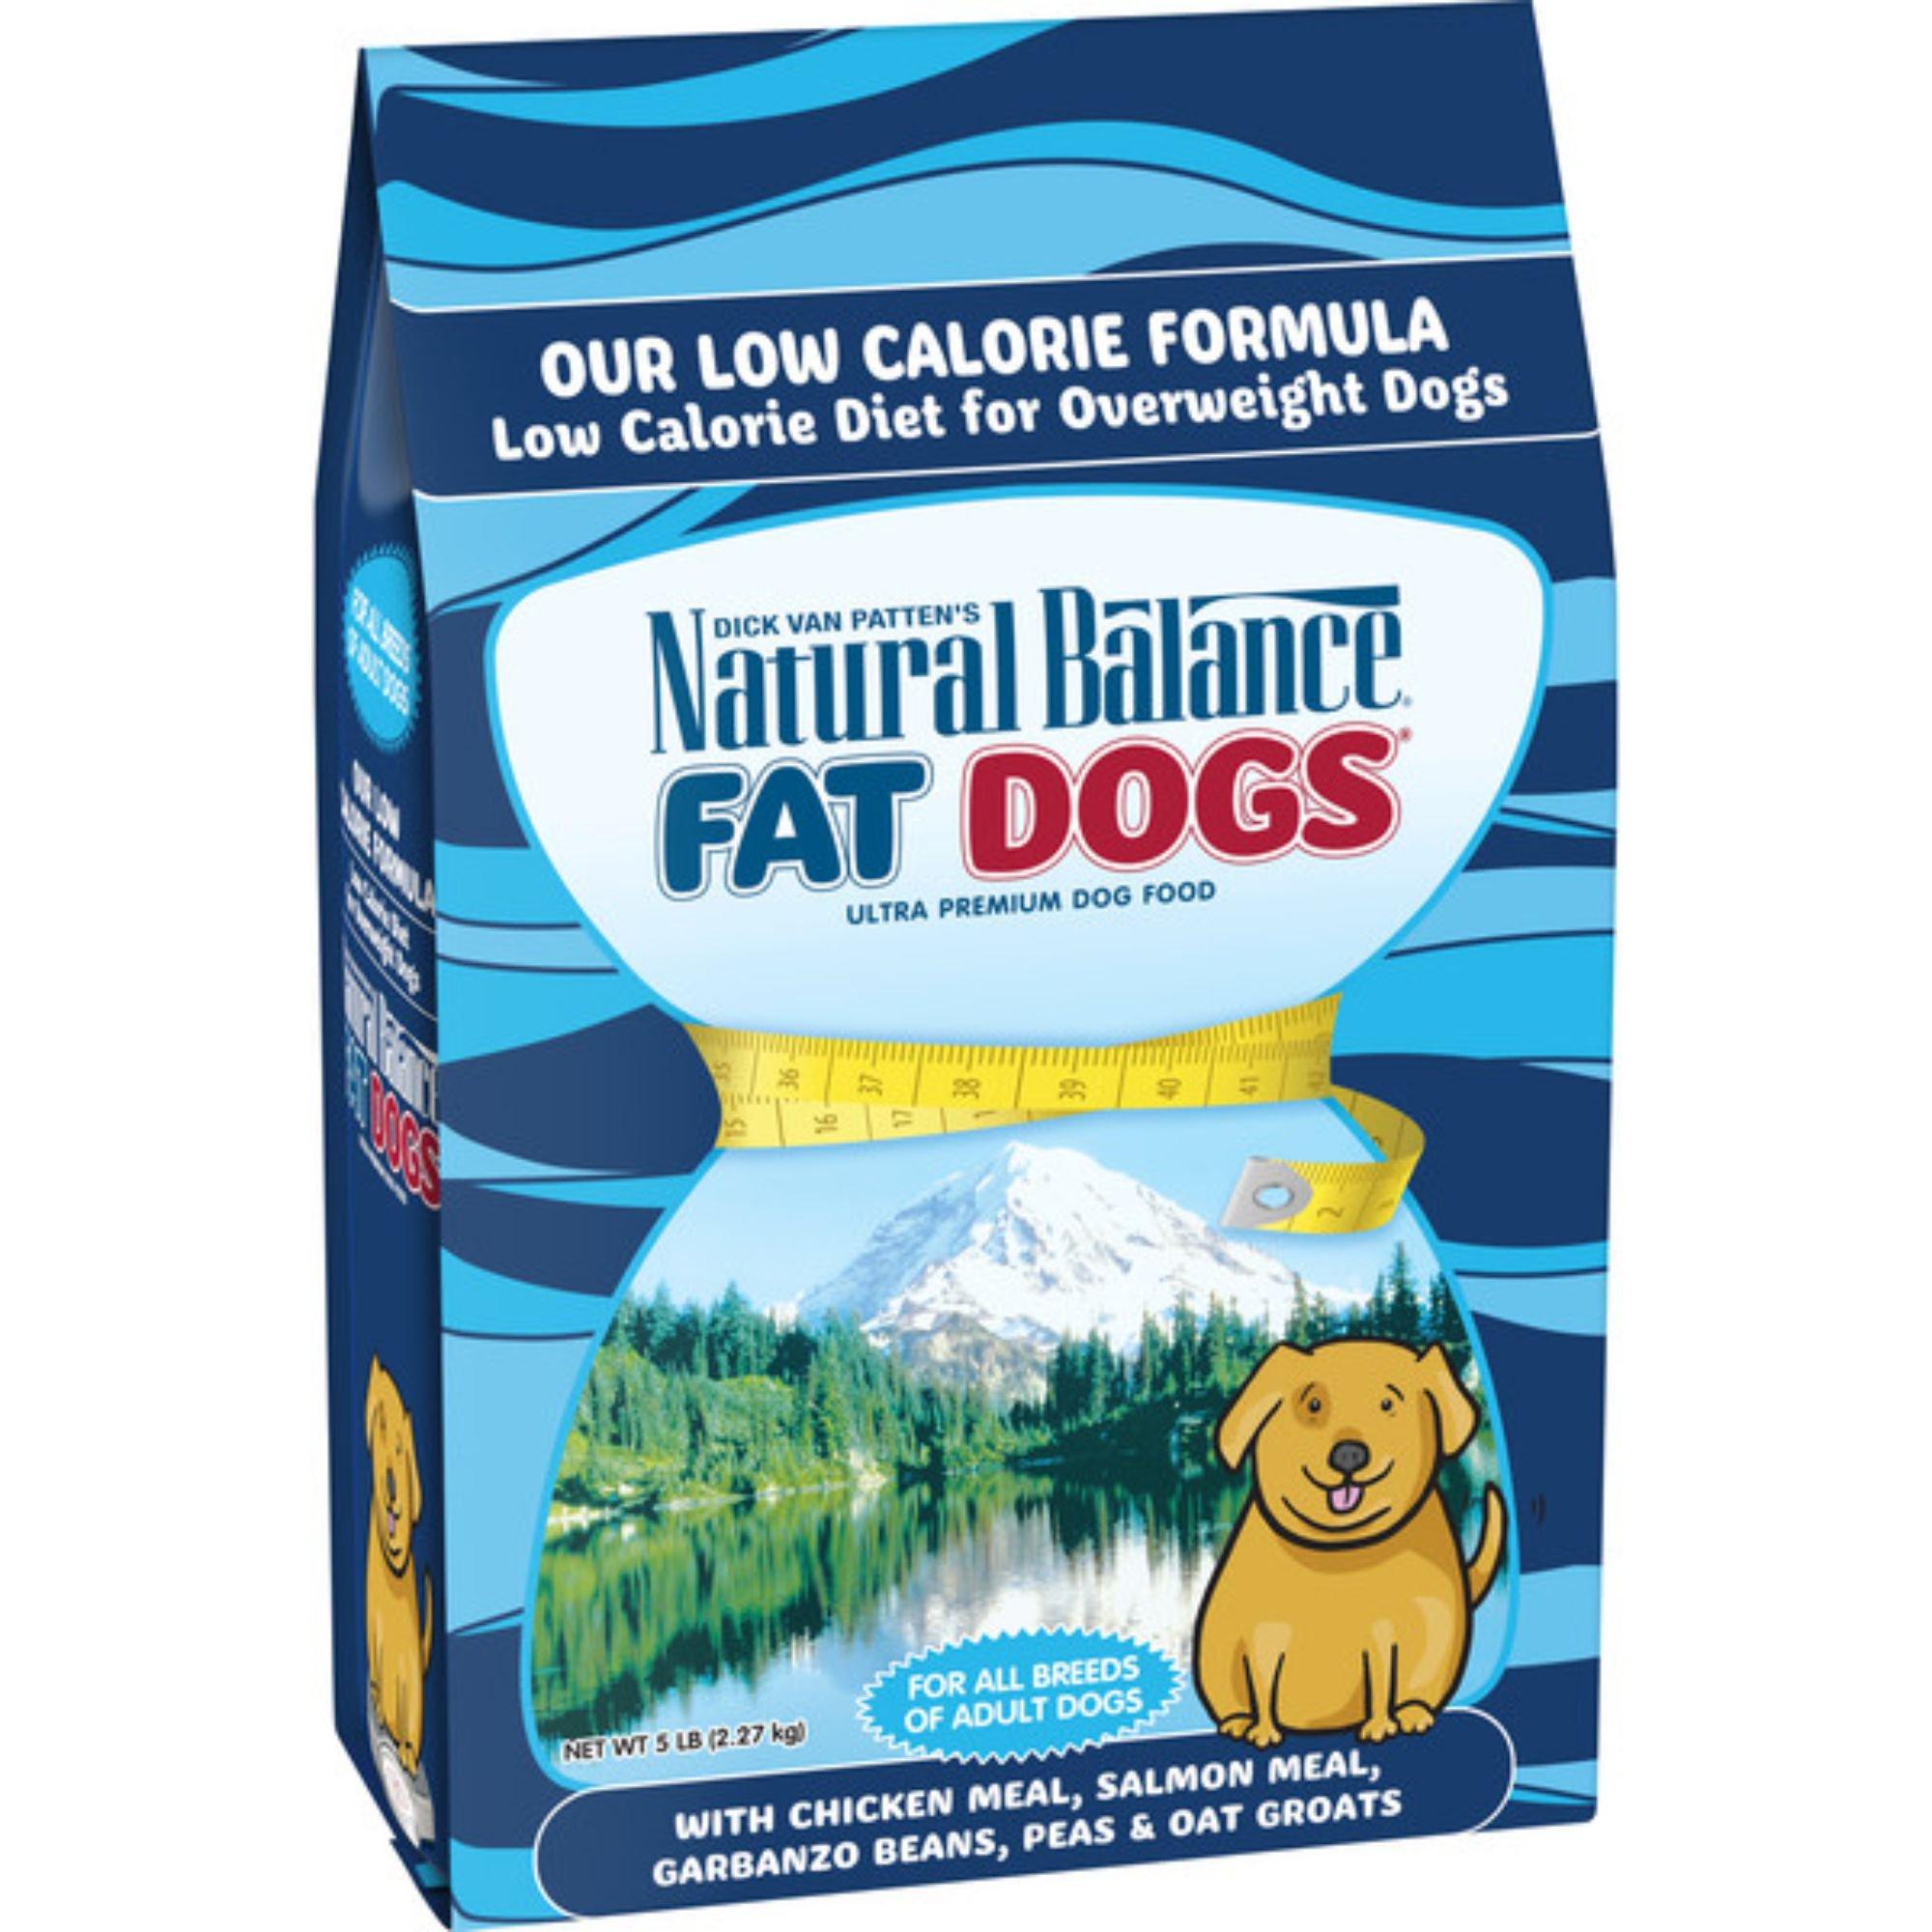 Natural Balance Fat Dogs Adult Dog Food